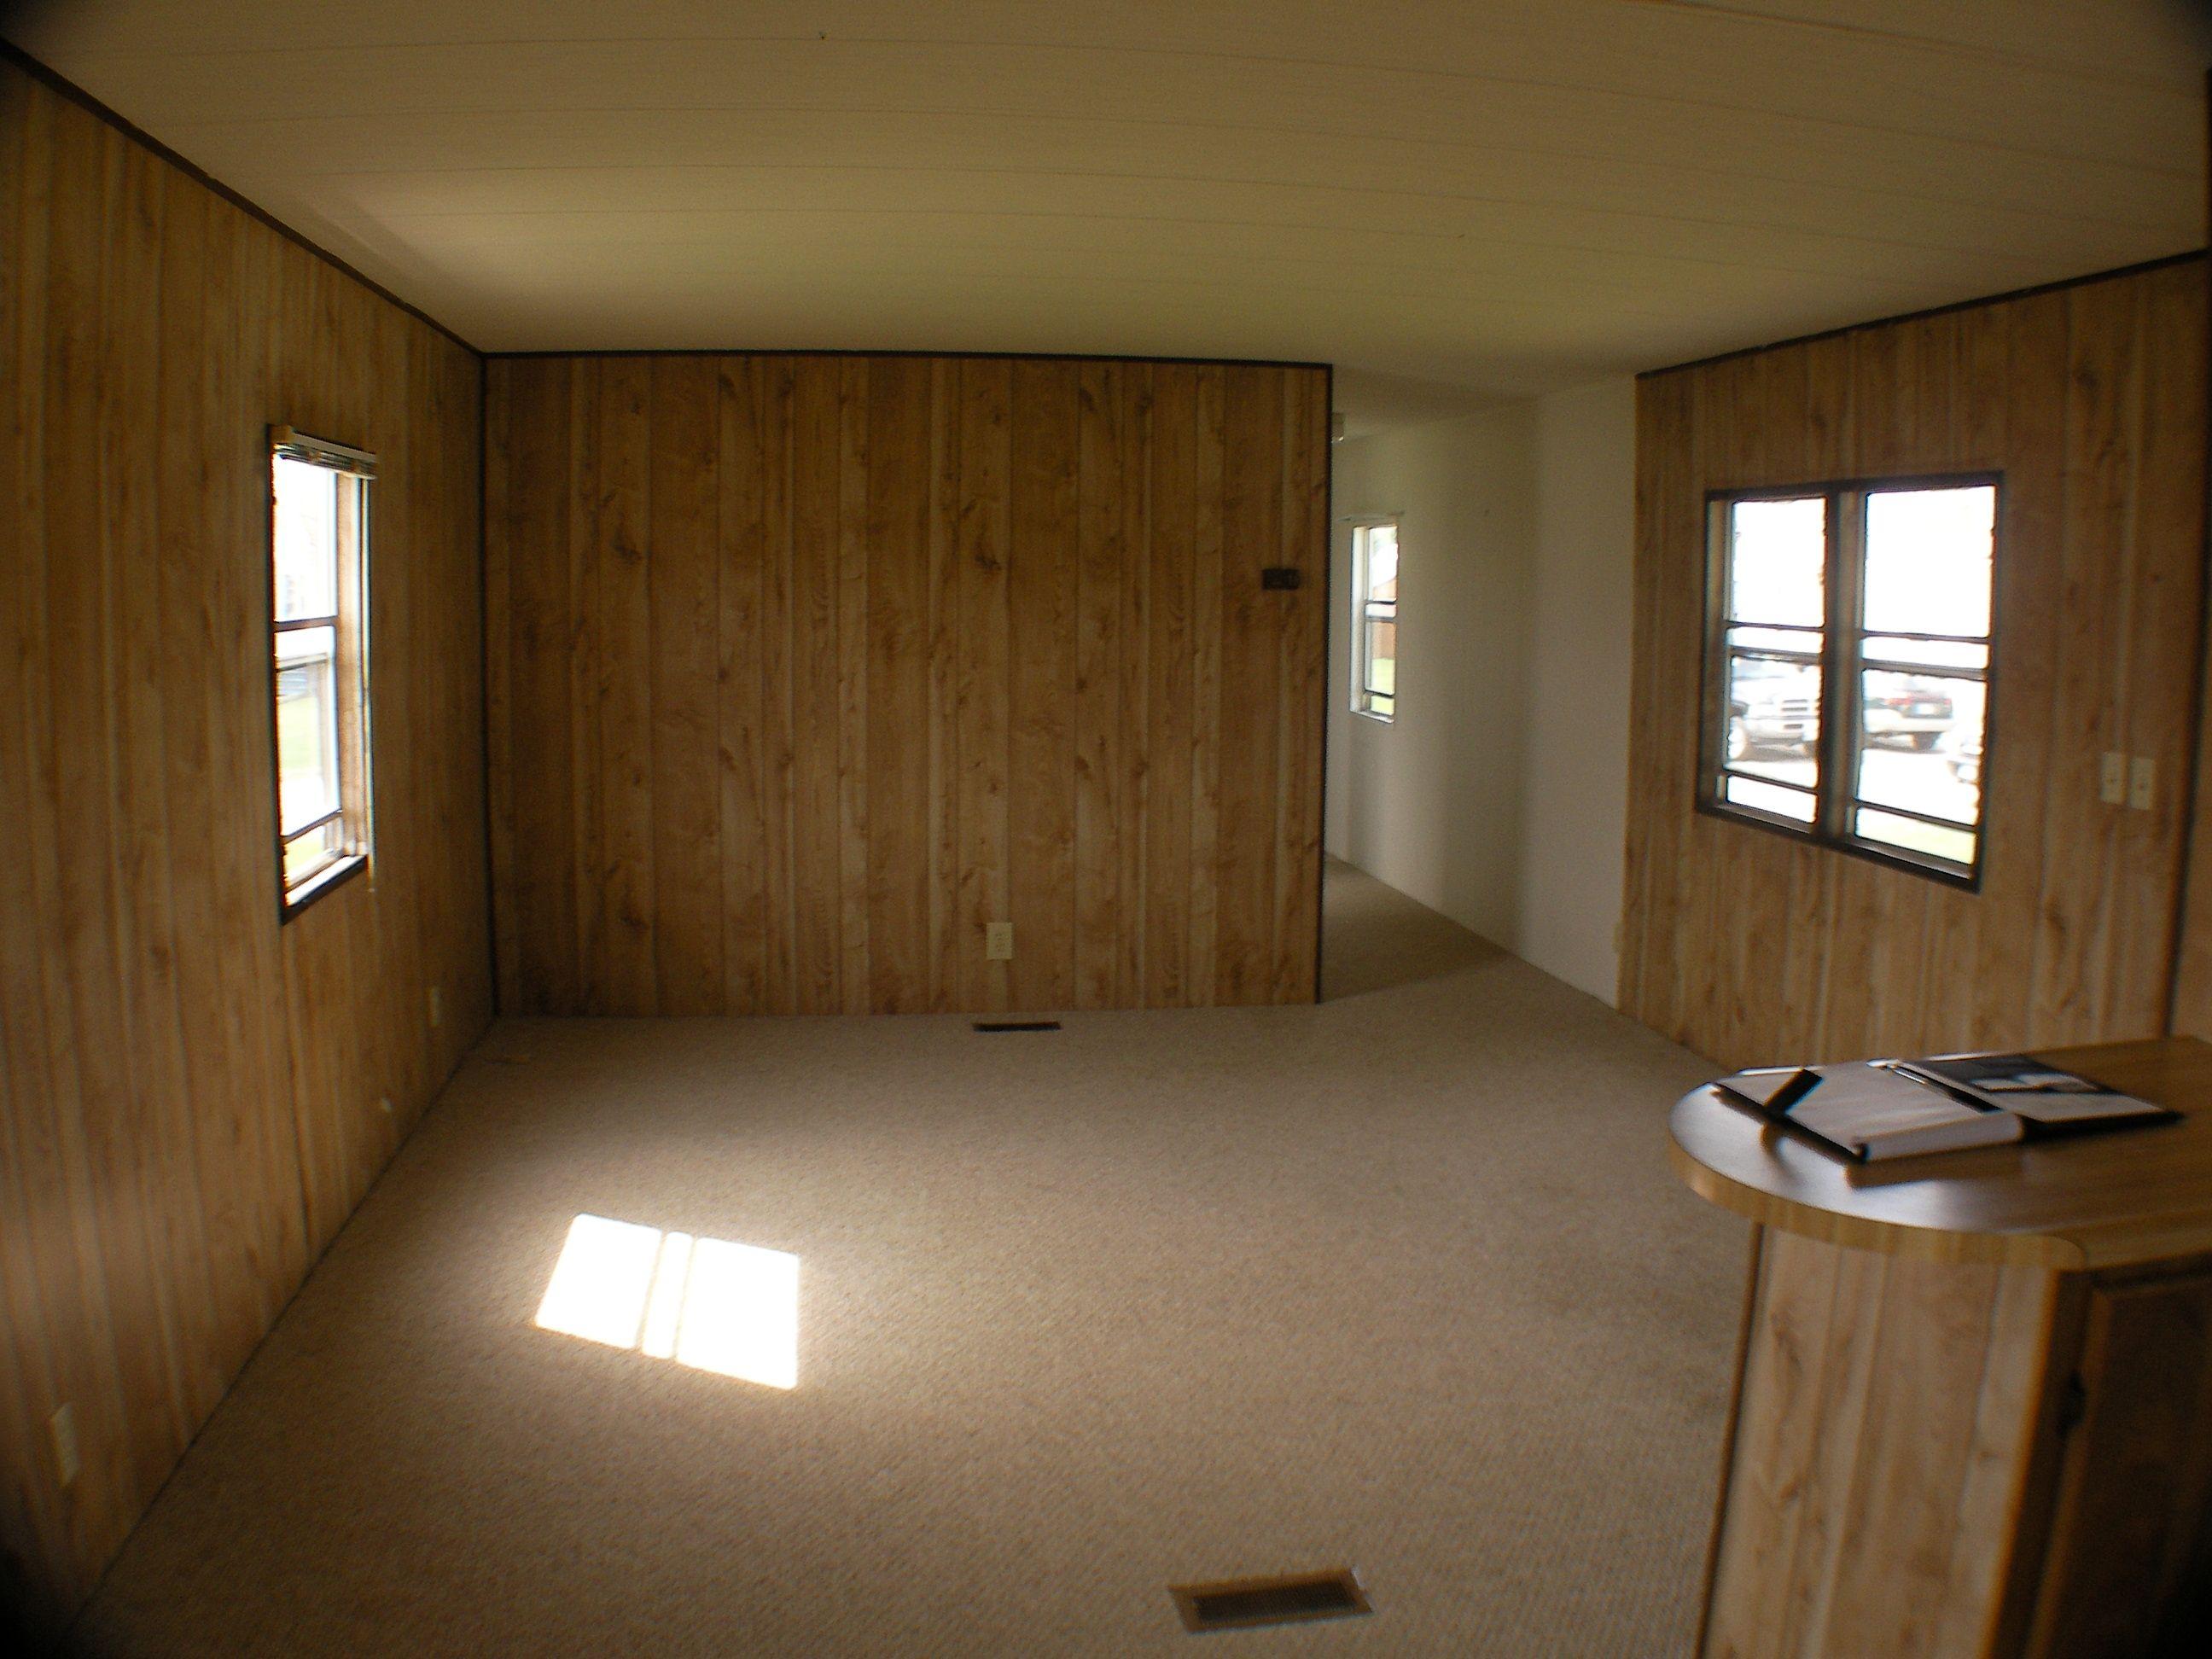 1983 (14\' x 72\'+ Deck) 3 Bedroom, 2 bath single wide mobile home ...